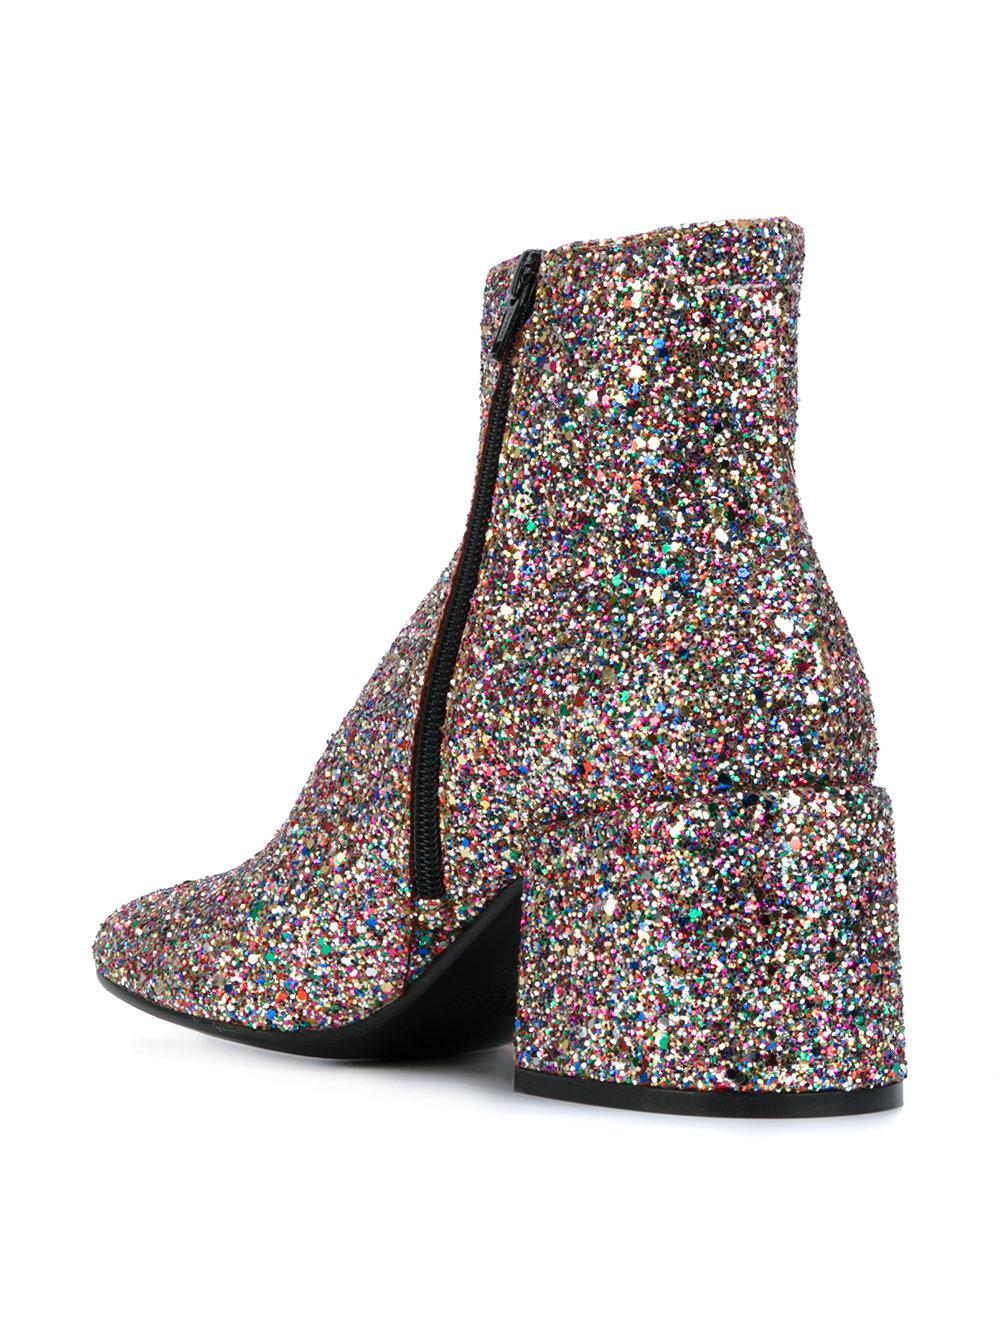 MM6 by Maison Martin Margiela Leather Glitter Boot